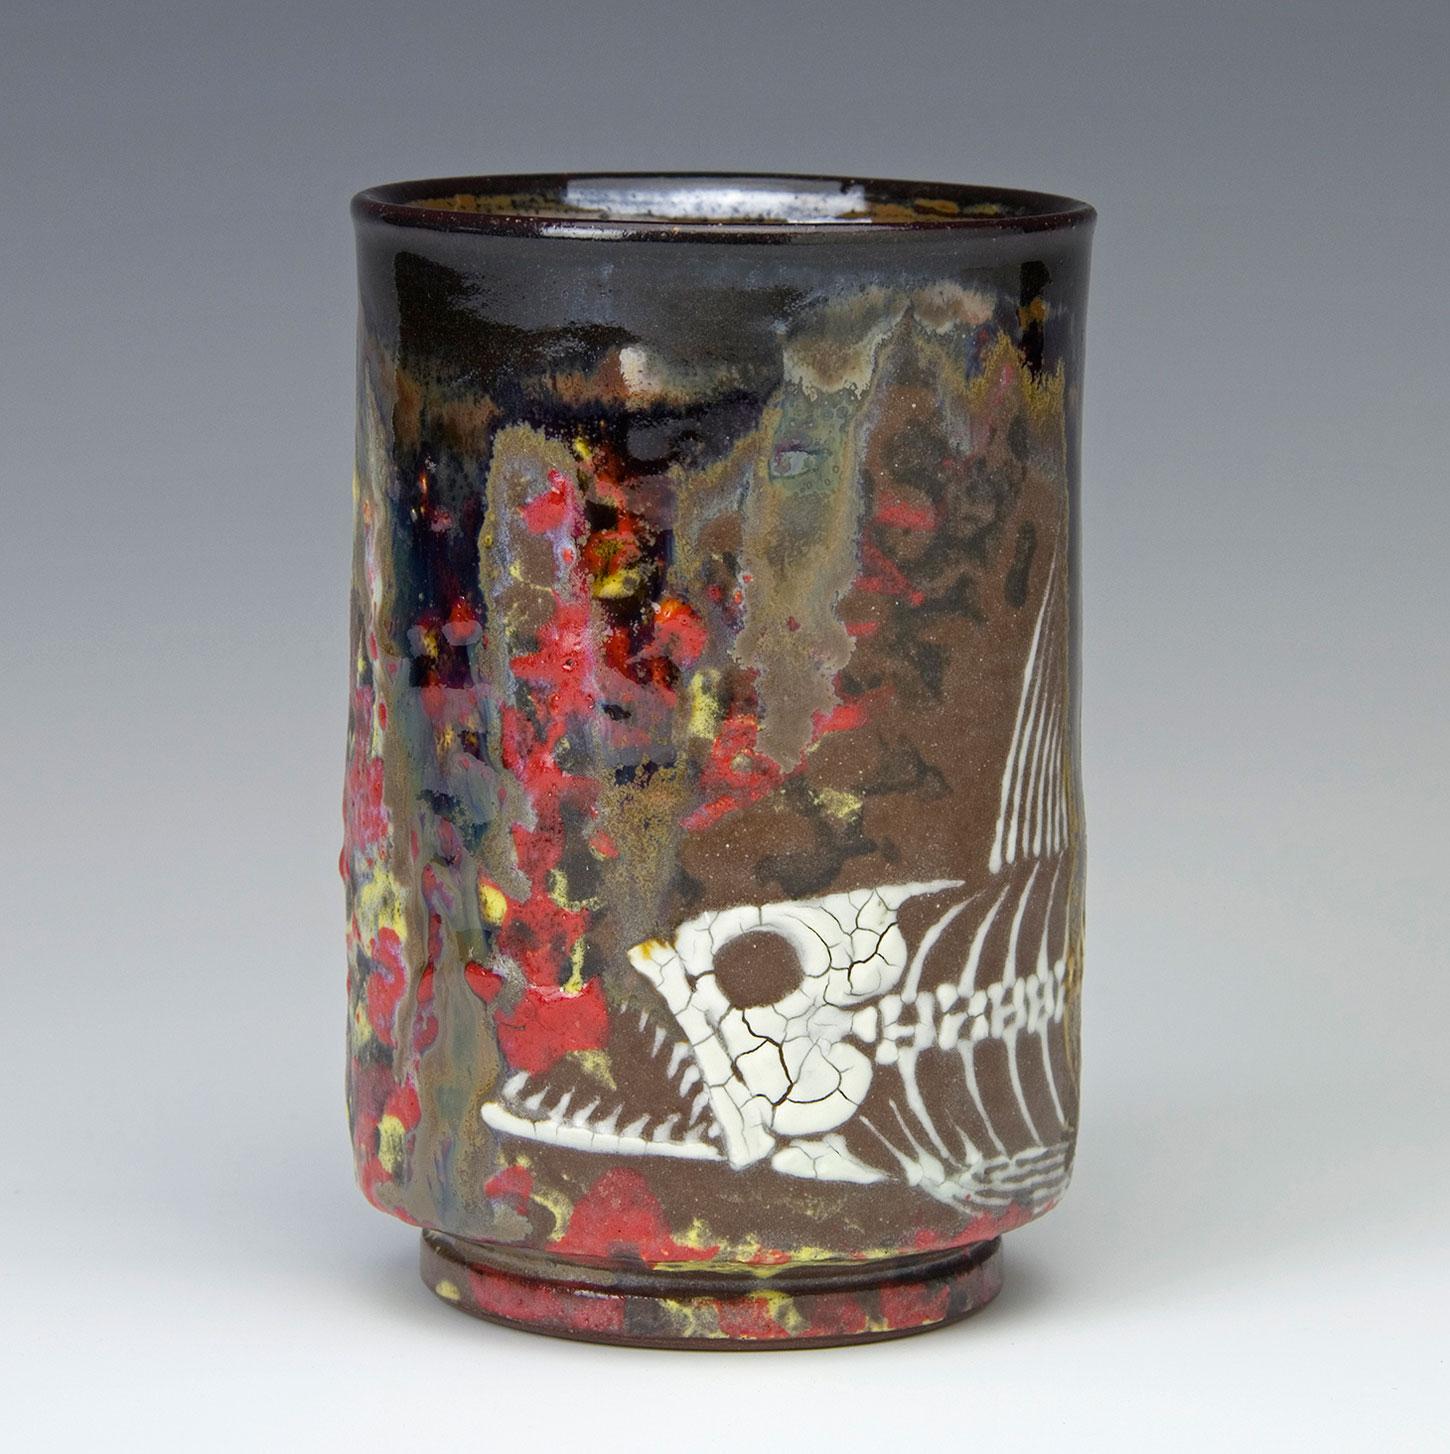 Fossil-Fish-Handmade-Art-Cup-Bruce-Gholson.jpg